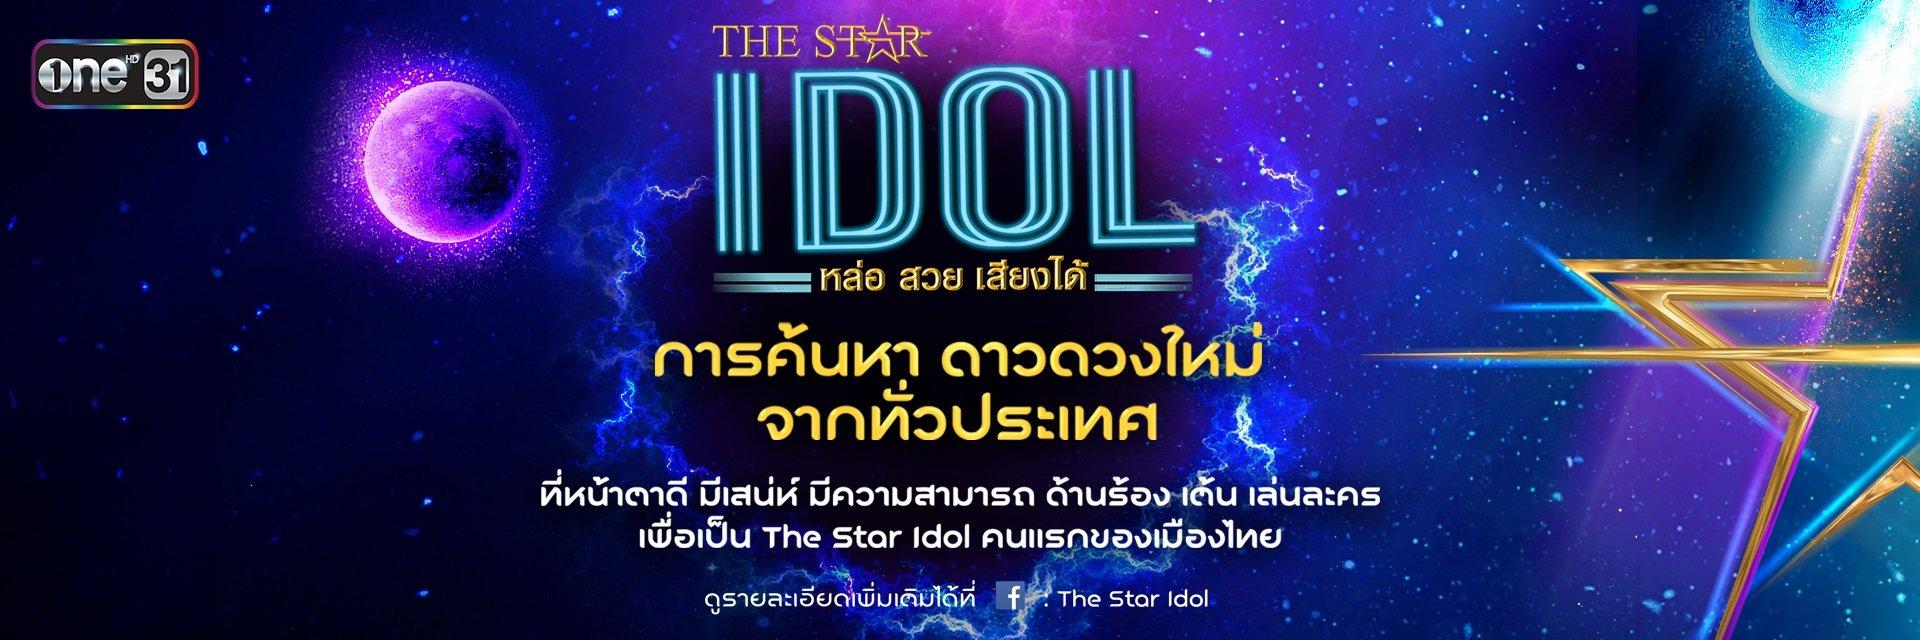 The Star Idol รับสมัคร